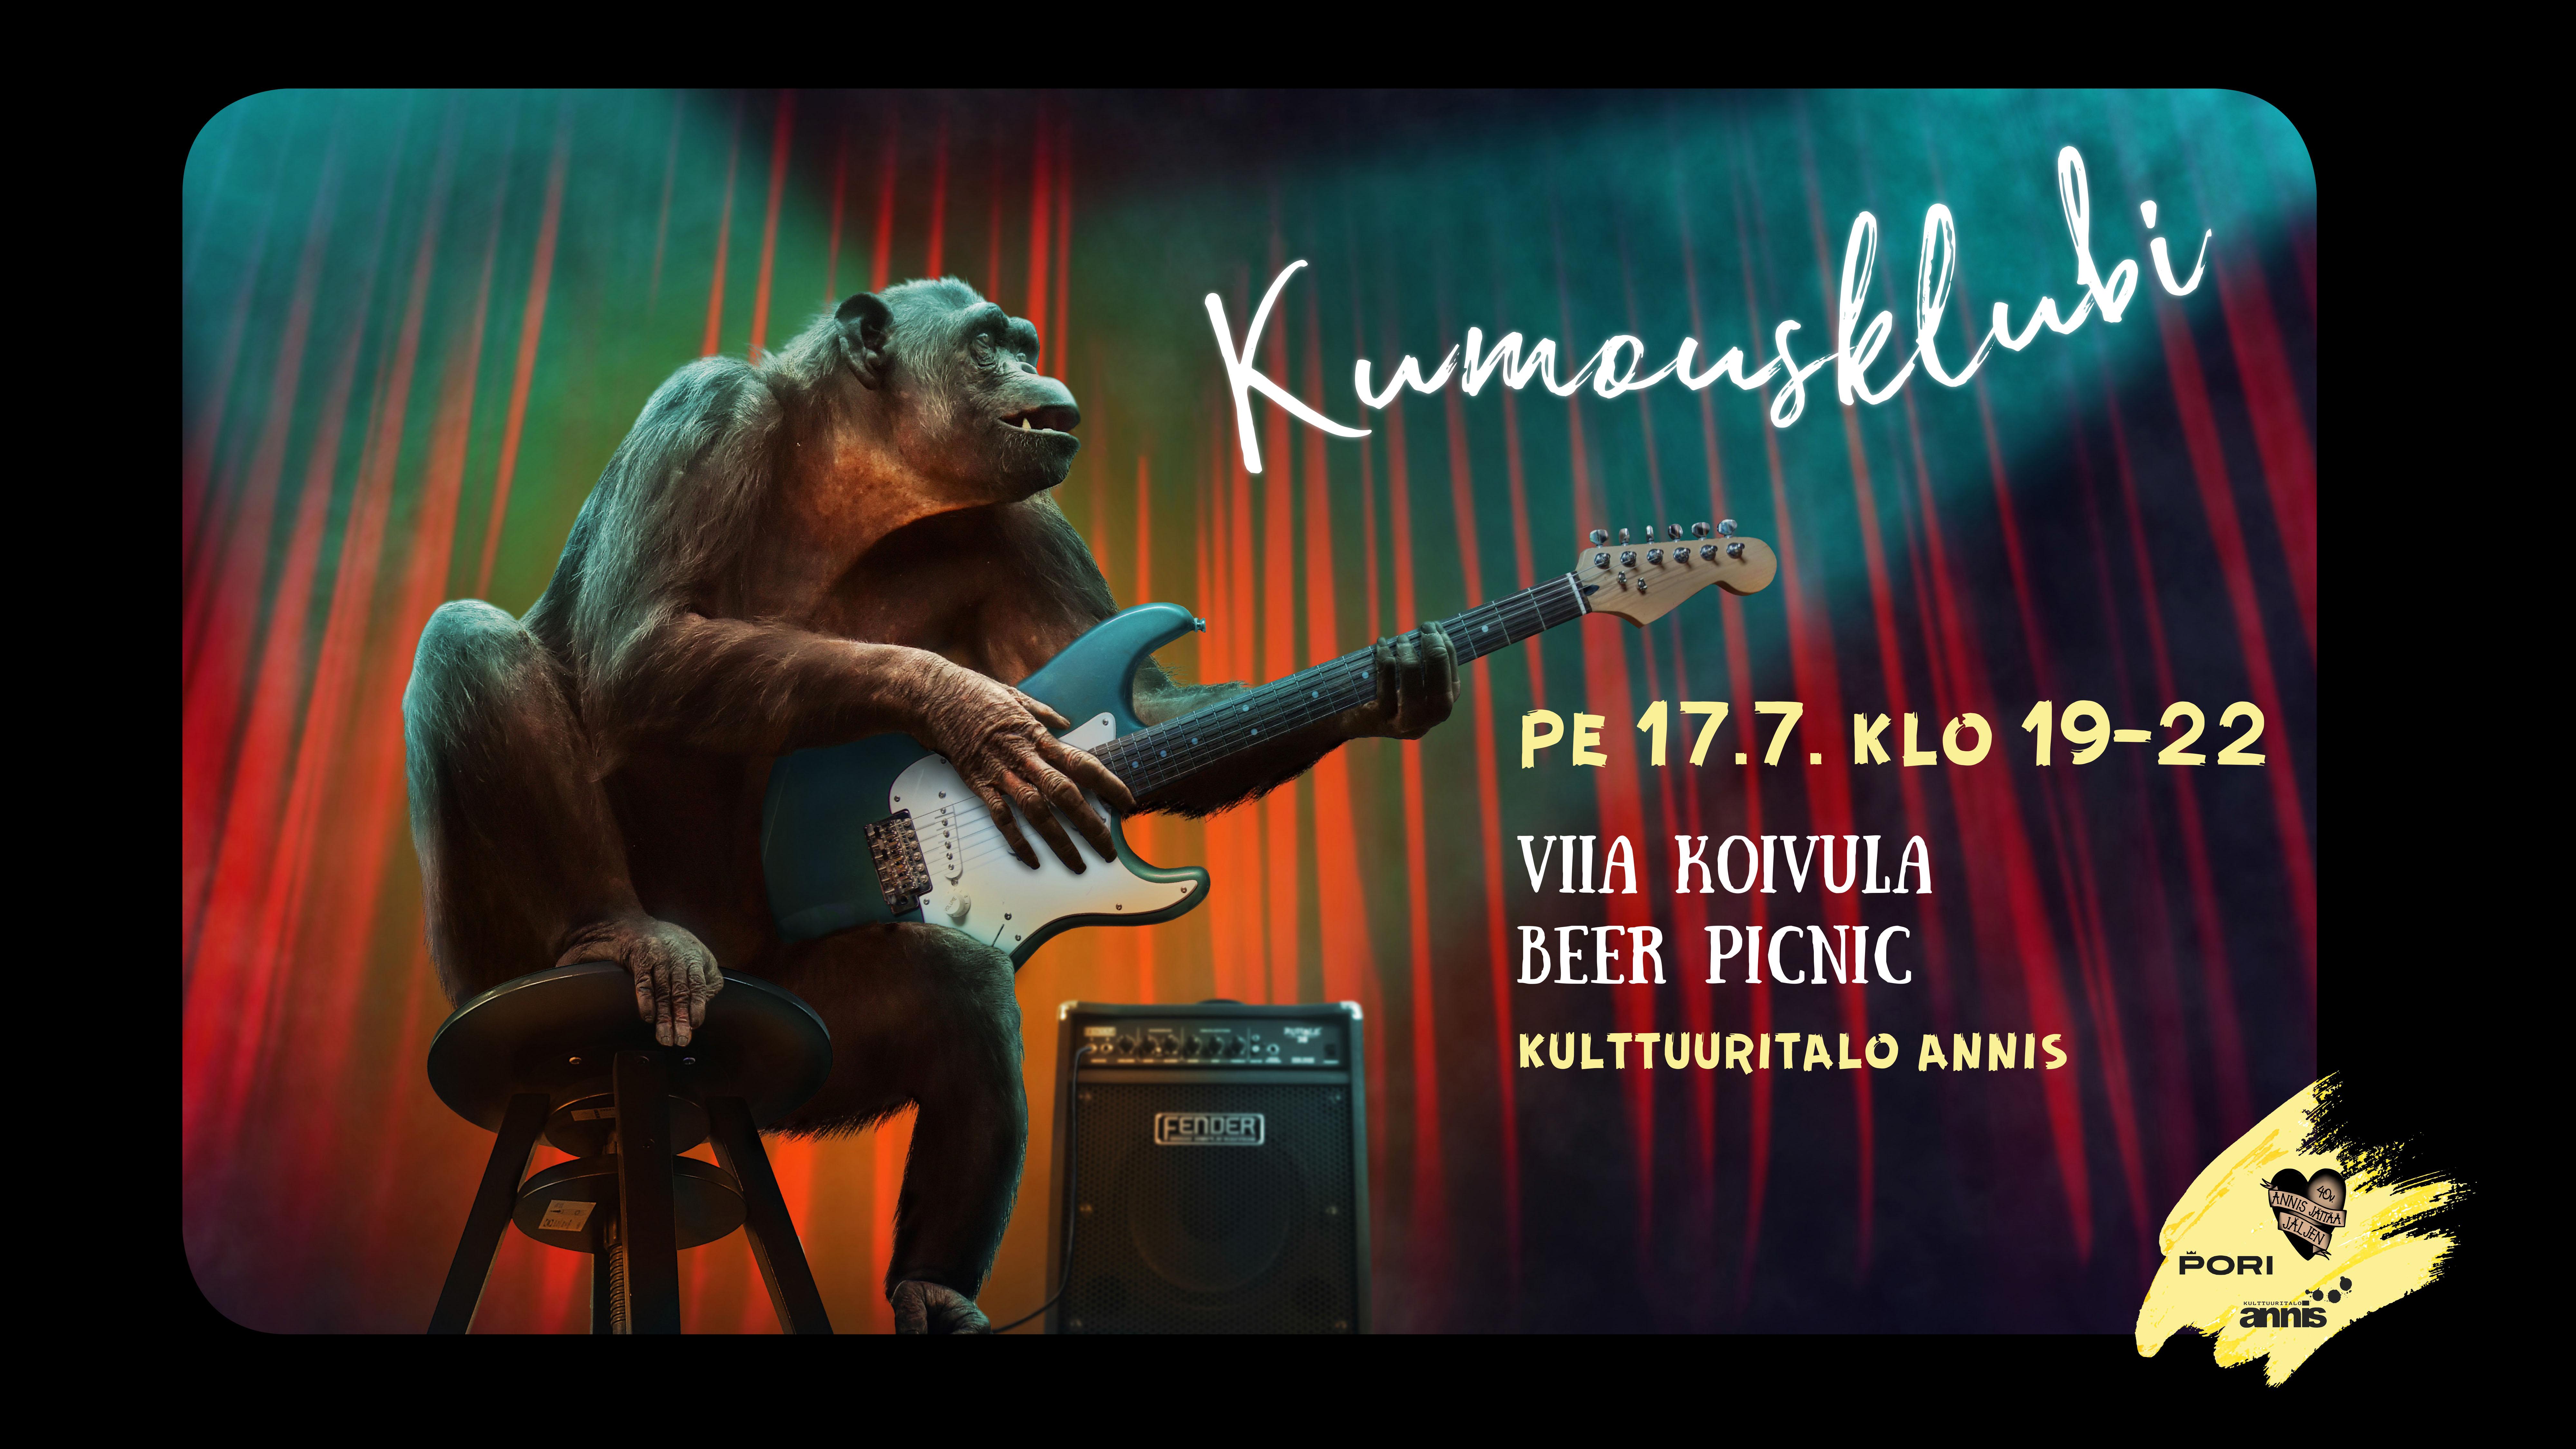 Kulttuuritalo Annis: Kumousklubi, Viia Koivula, Beer Picnic